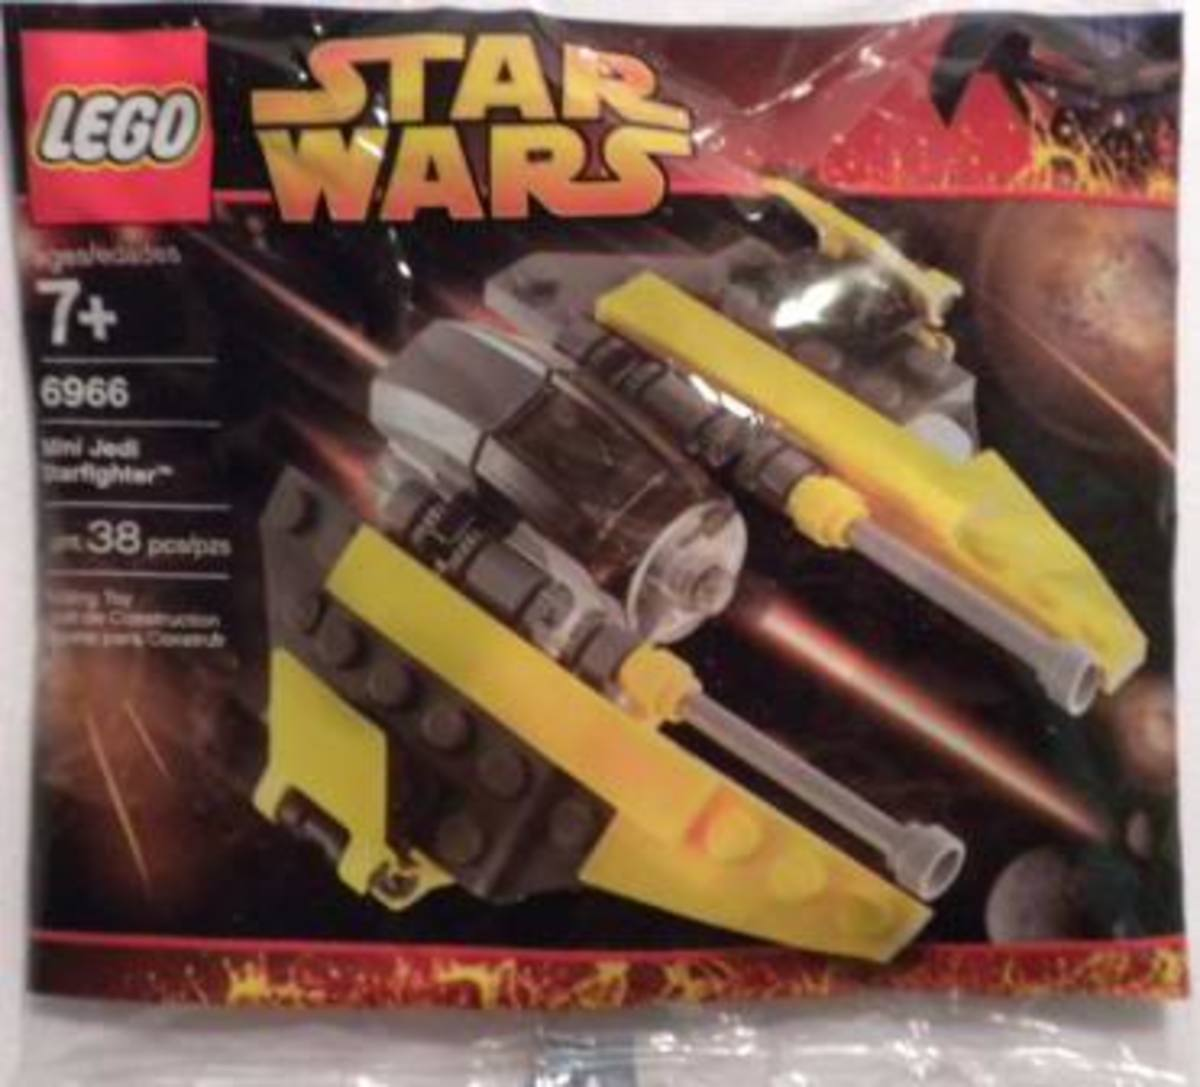 LEGO Star Wars Jedi Starfighter 6966 Bag